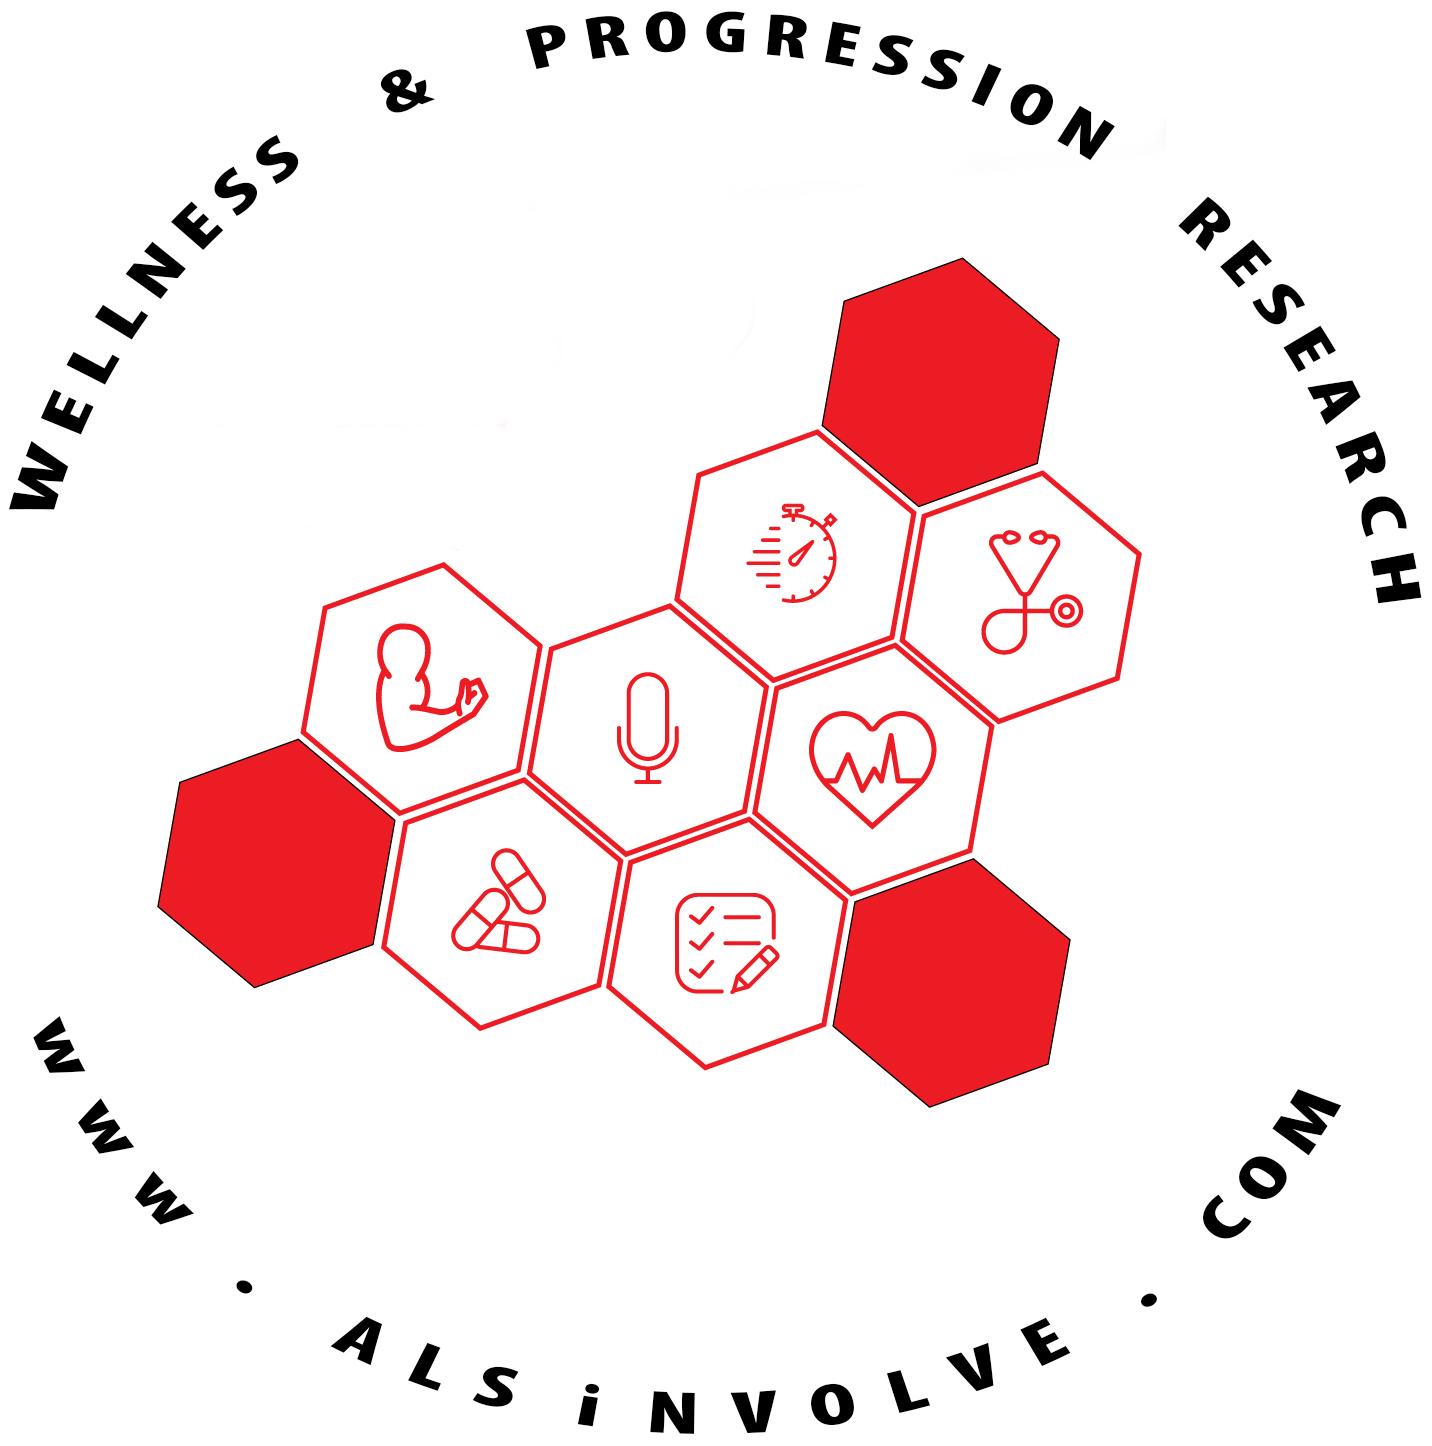 Wellness & Progression Research - www.alsinvolve.com